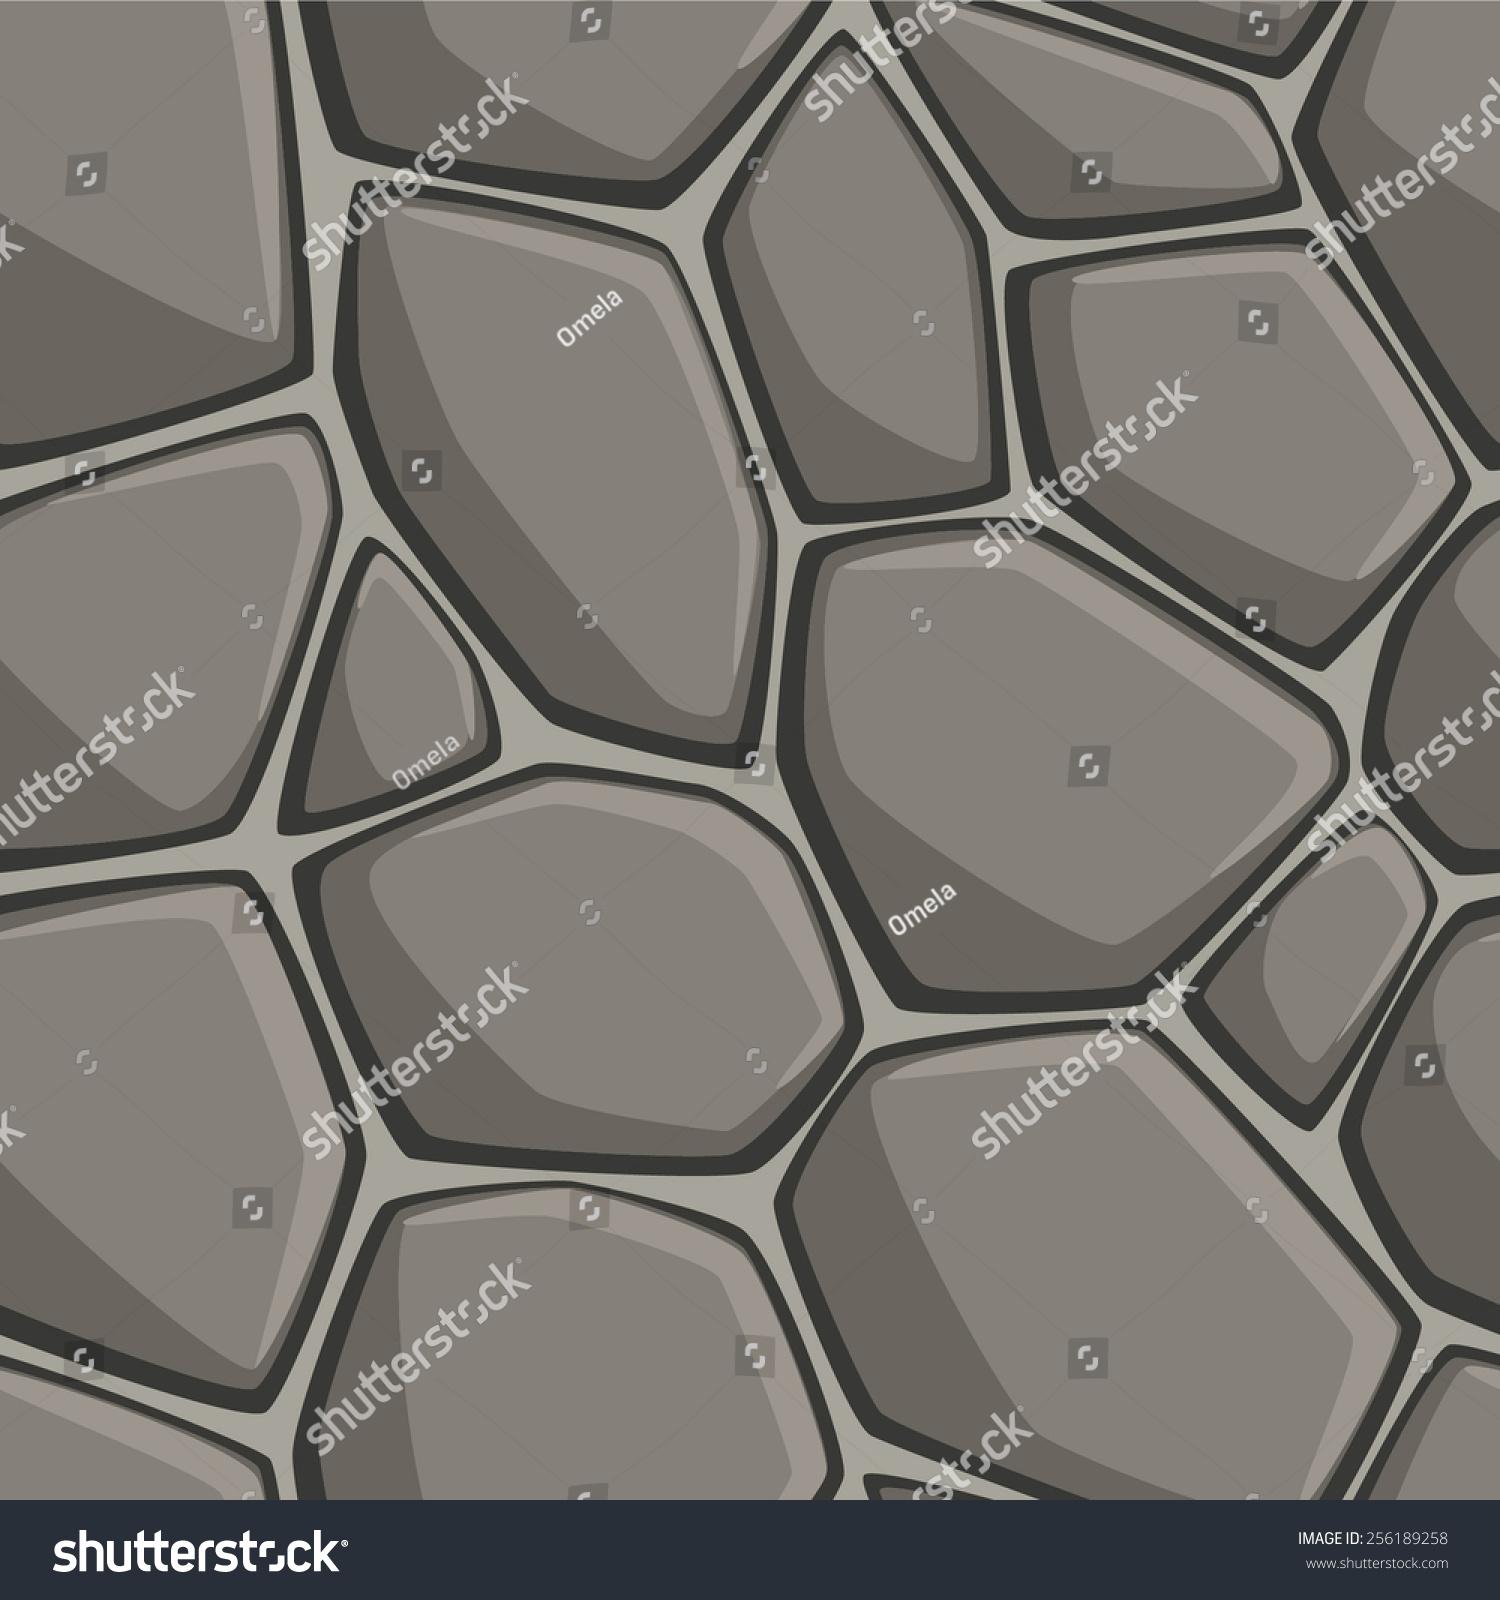 cartoon square stones texture - photo #18